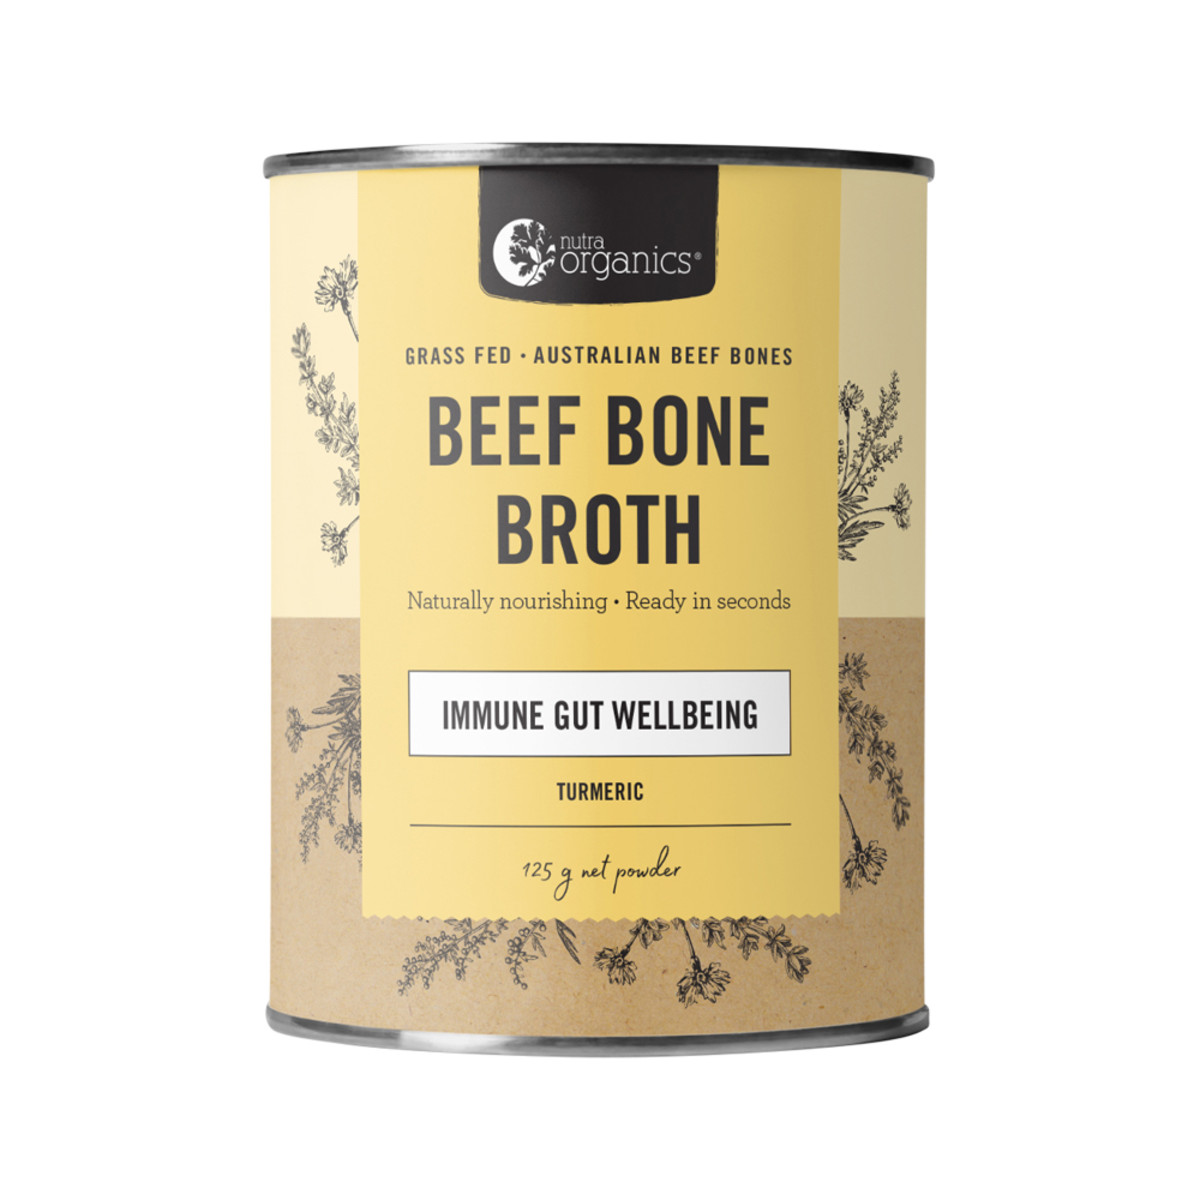 Nutra Organics Beef Bone Broth Powder - Turmeric